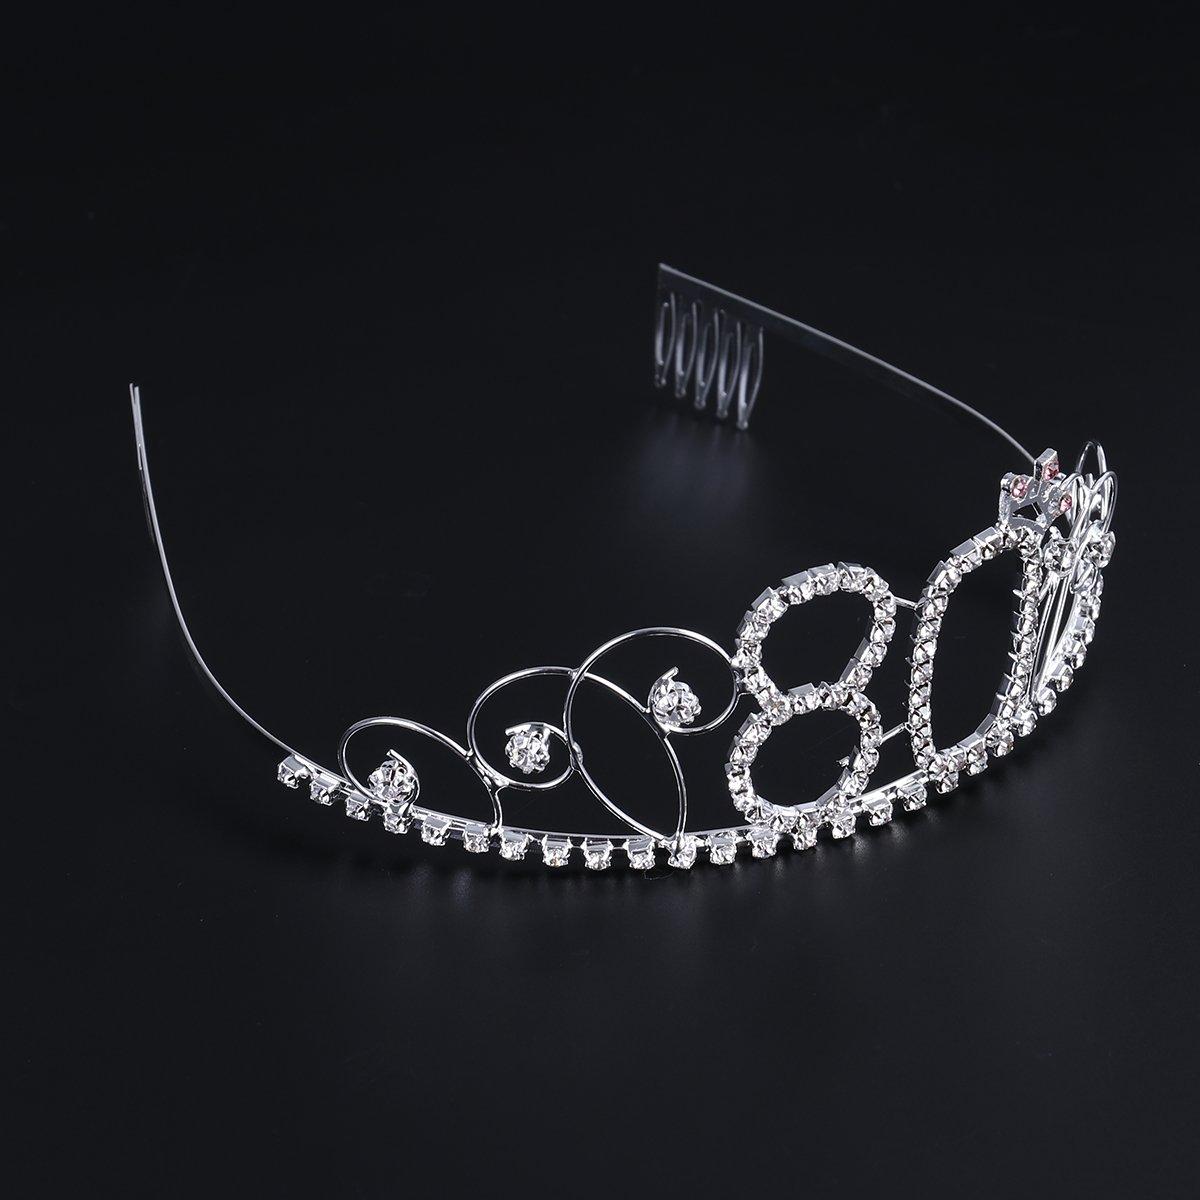 Plata Frcolor Corona Cumplea/ños 80 A/ños Diadema Cumplea/ños Mujer Tiara Cristal con Peines